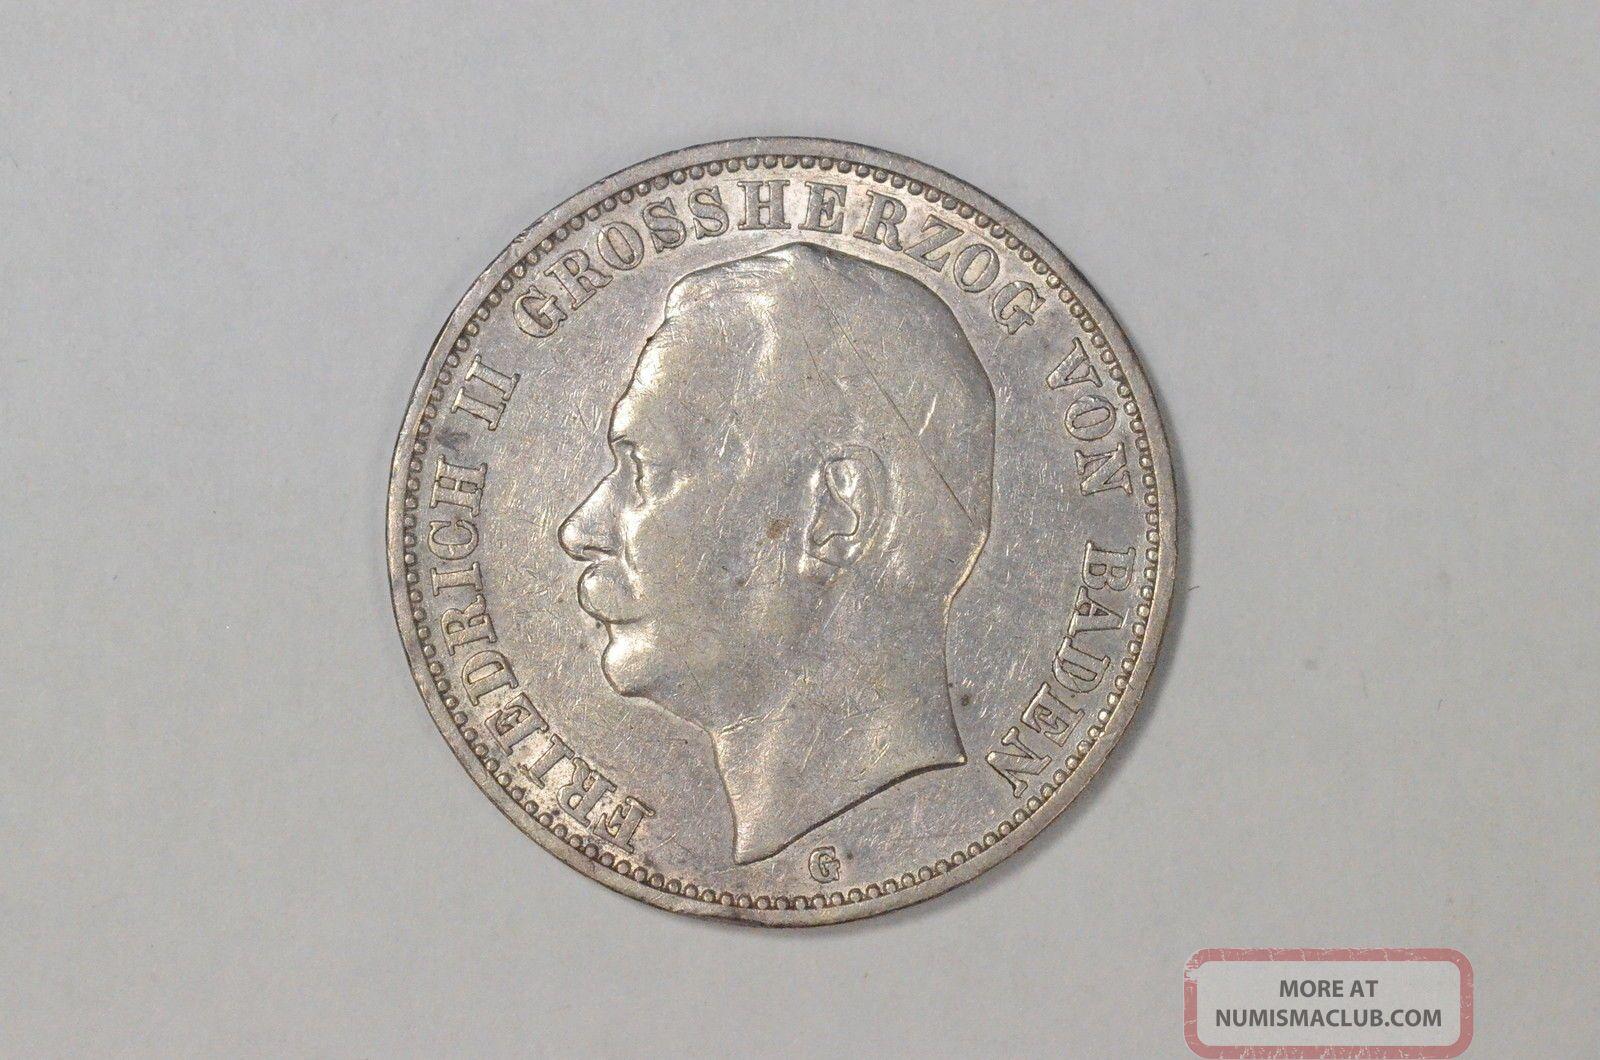 1912 - G 3 Mark Germany Baden.  900 Silver Coin Km 280 (850) Germany photo